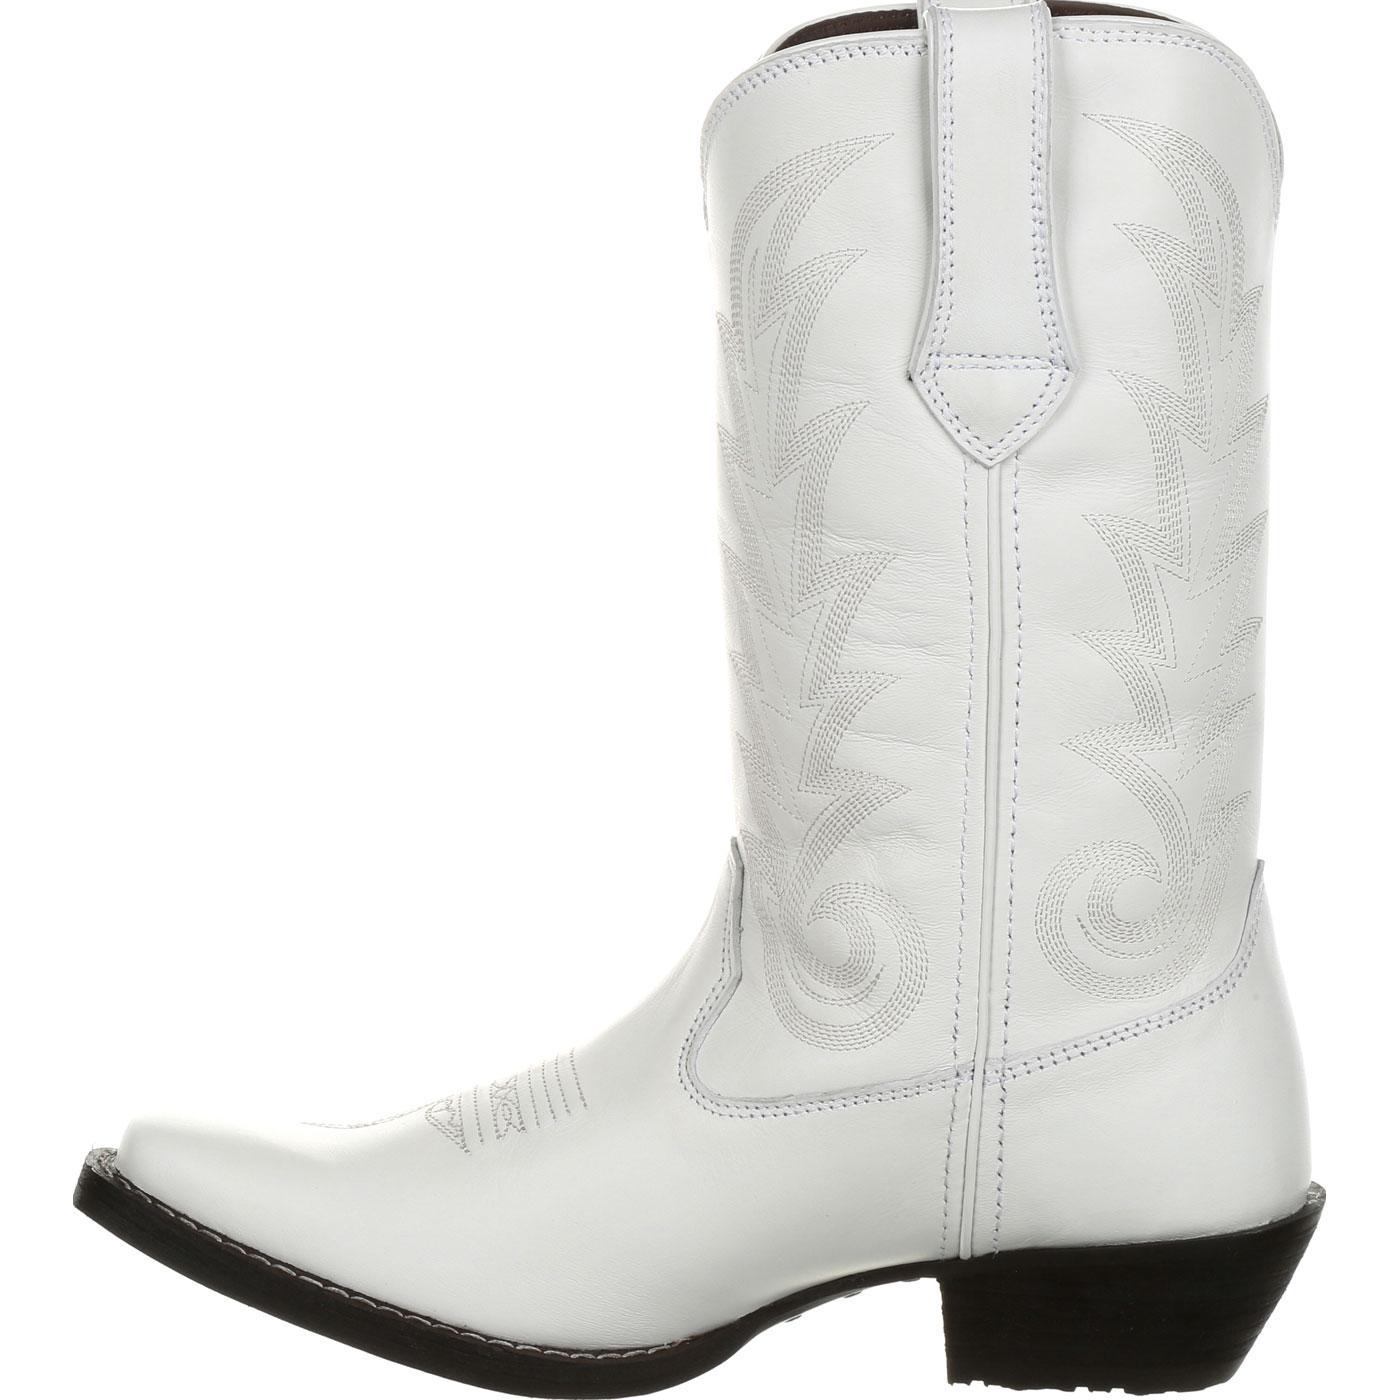 3e97781d04d Images. Durango Women s Classic White Western Boot ...